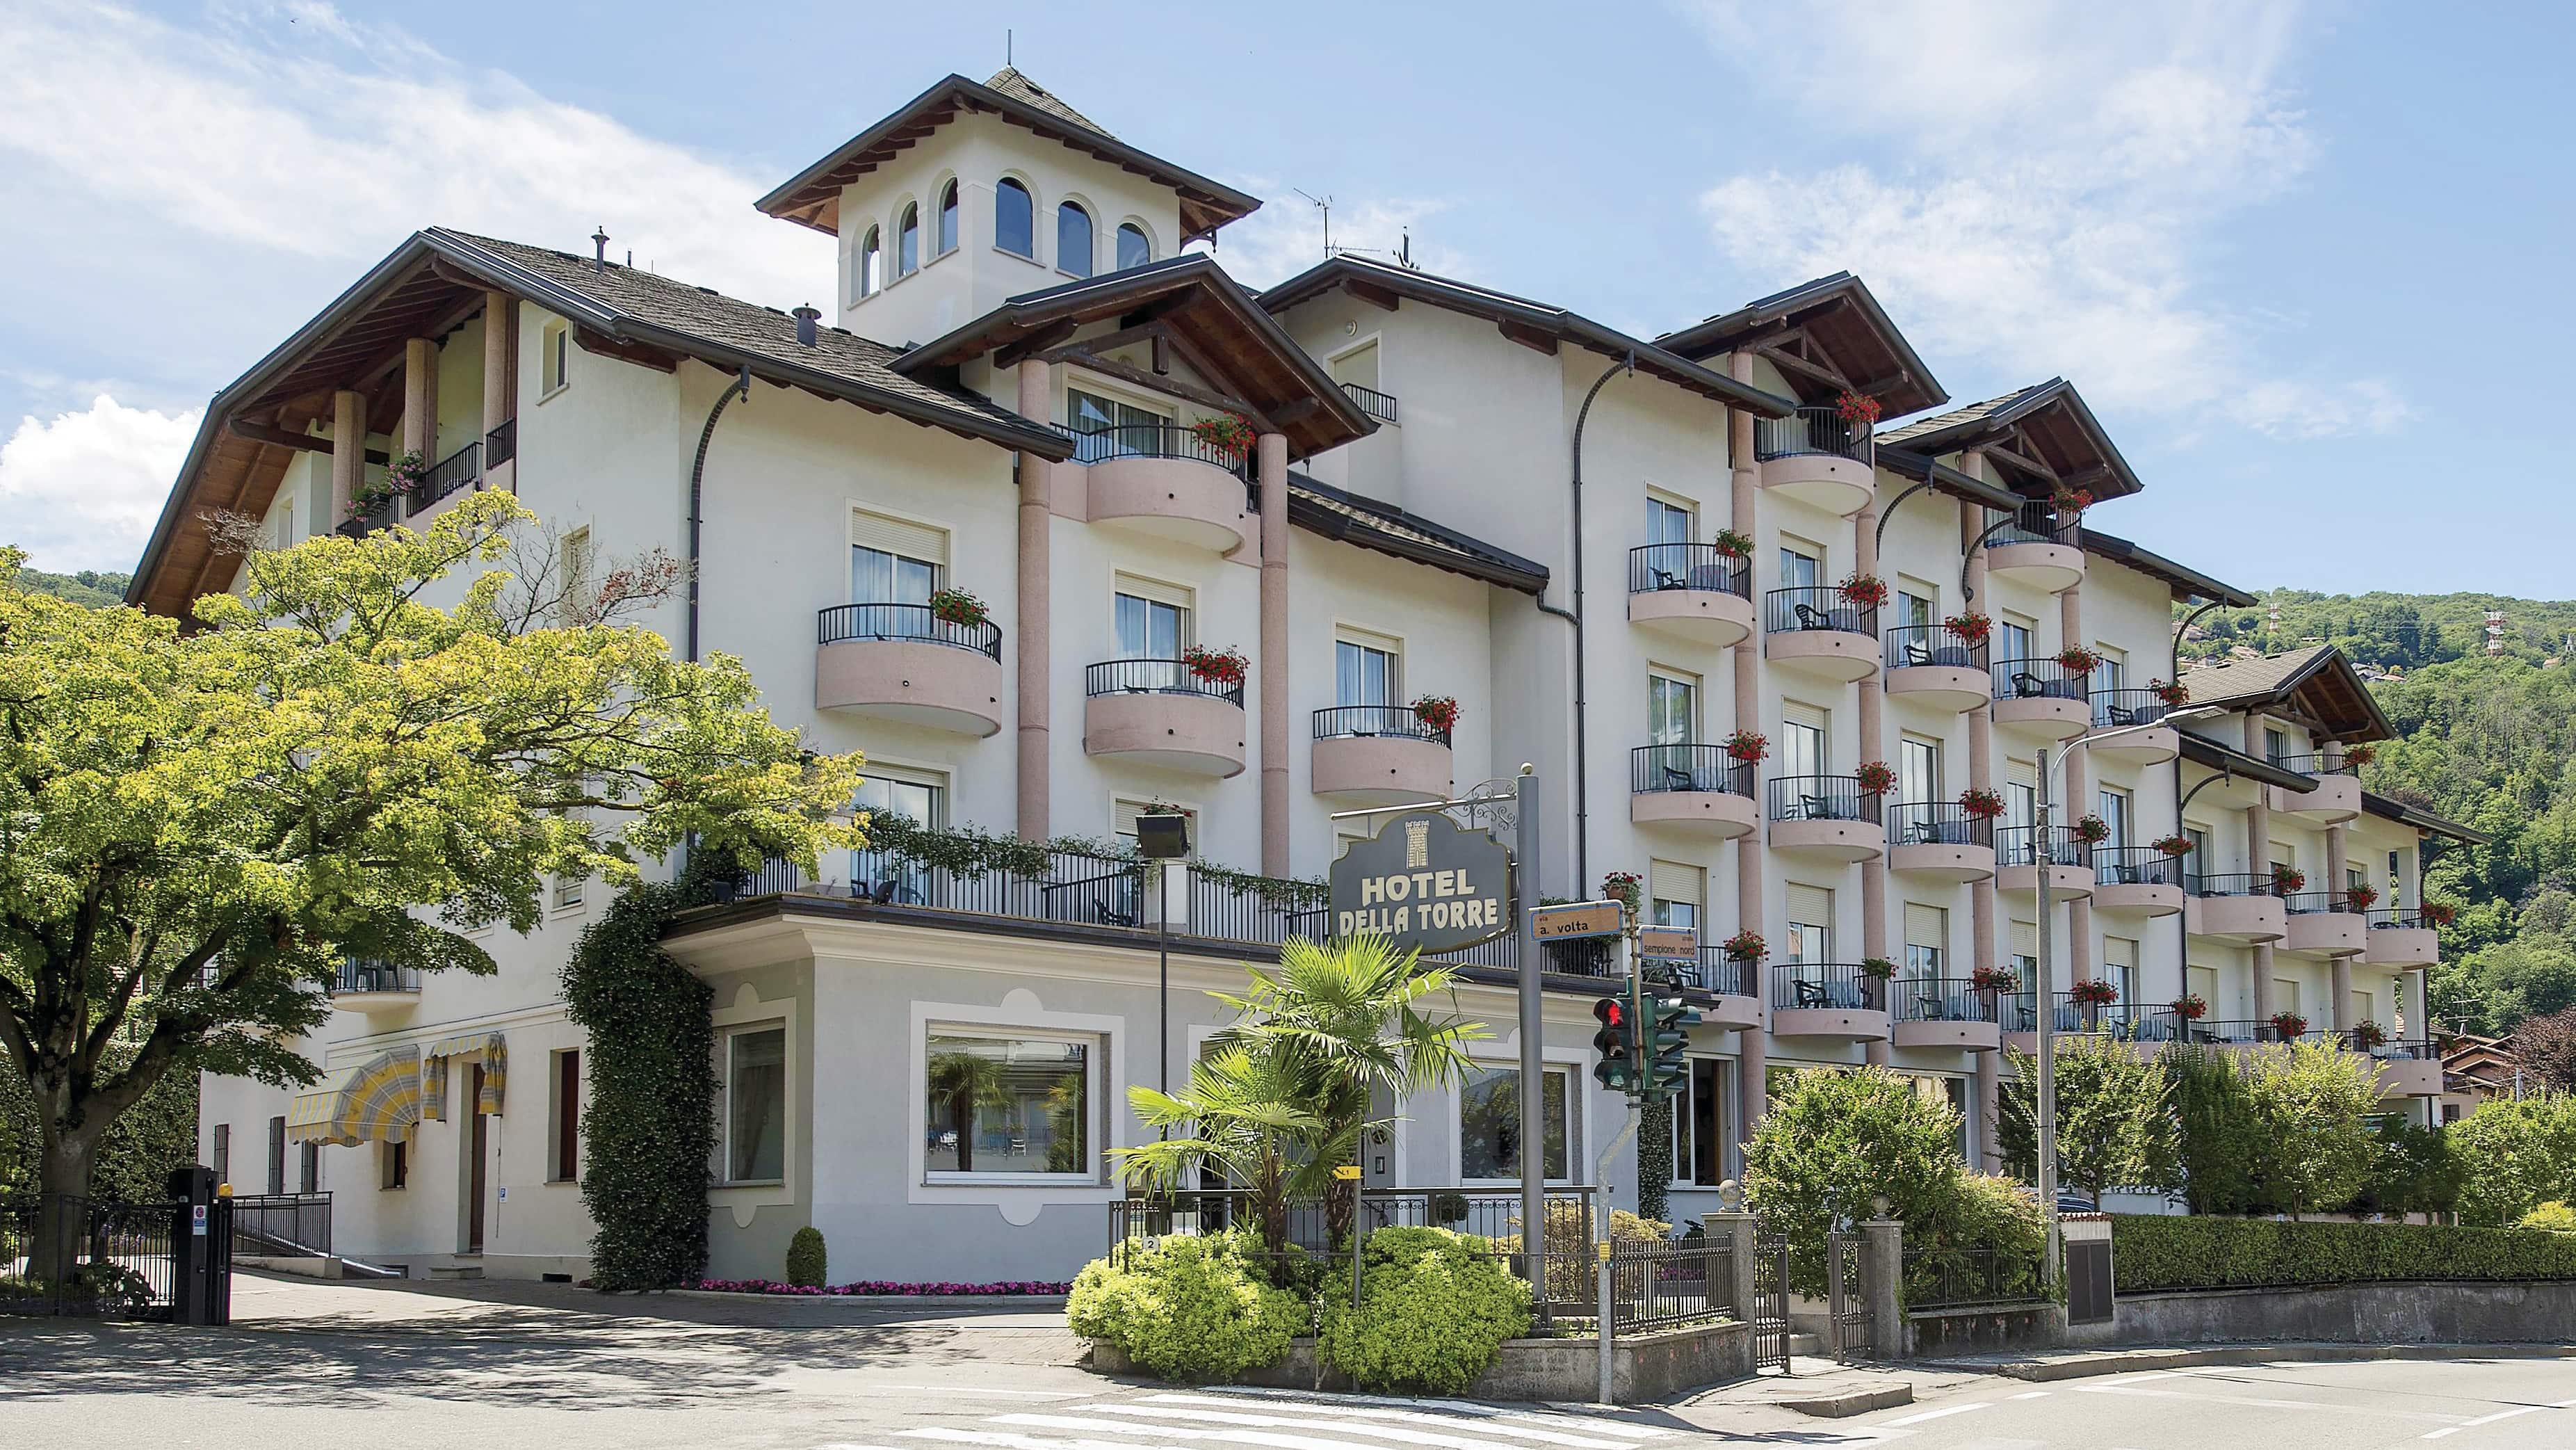 Exterior of the Hotel Della Torre